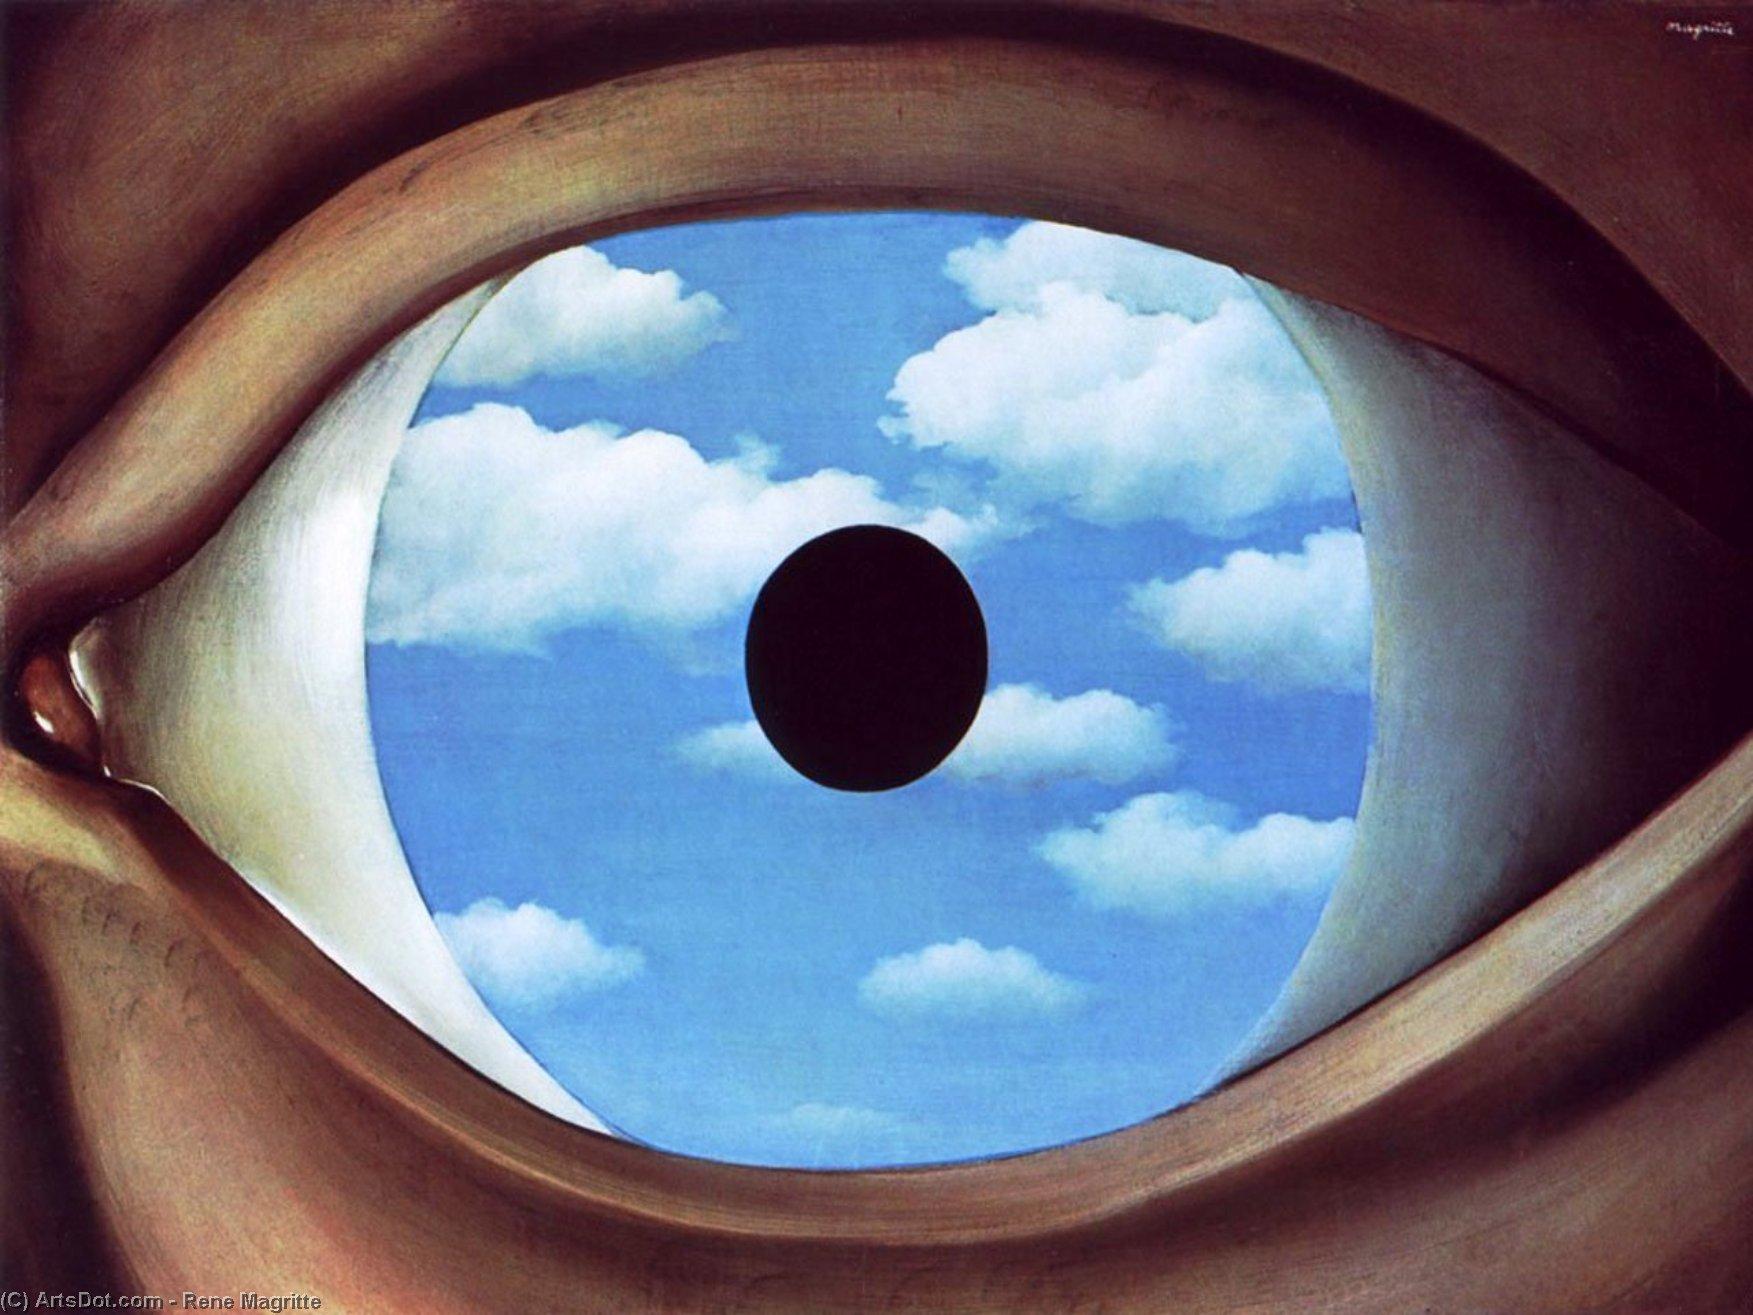 False Mirror - Rene Magritte